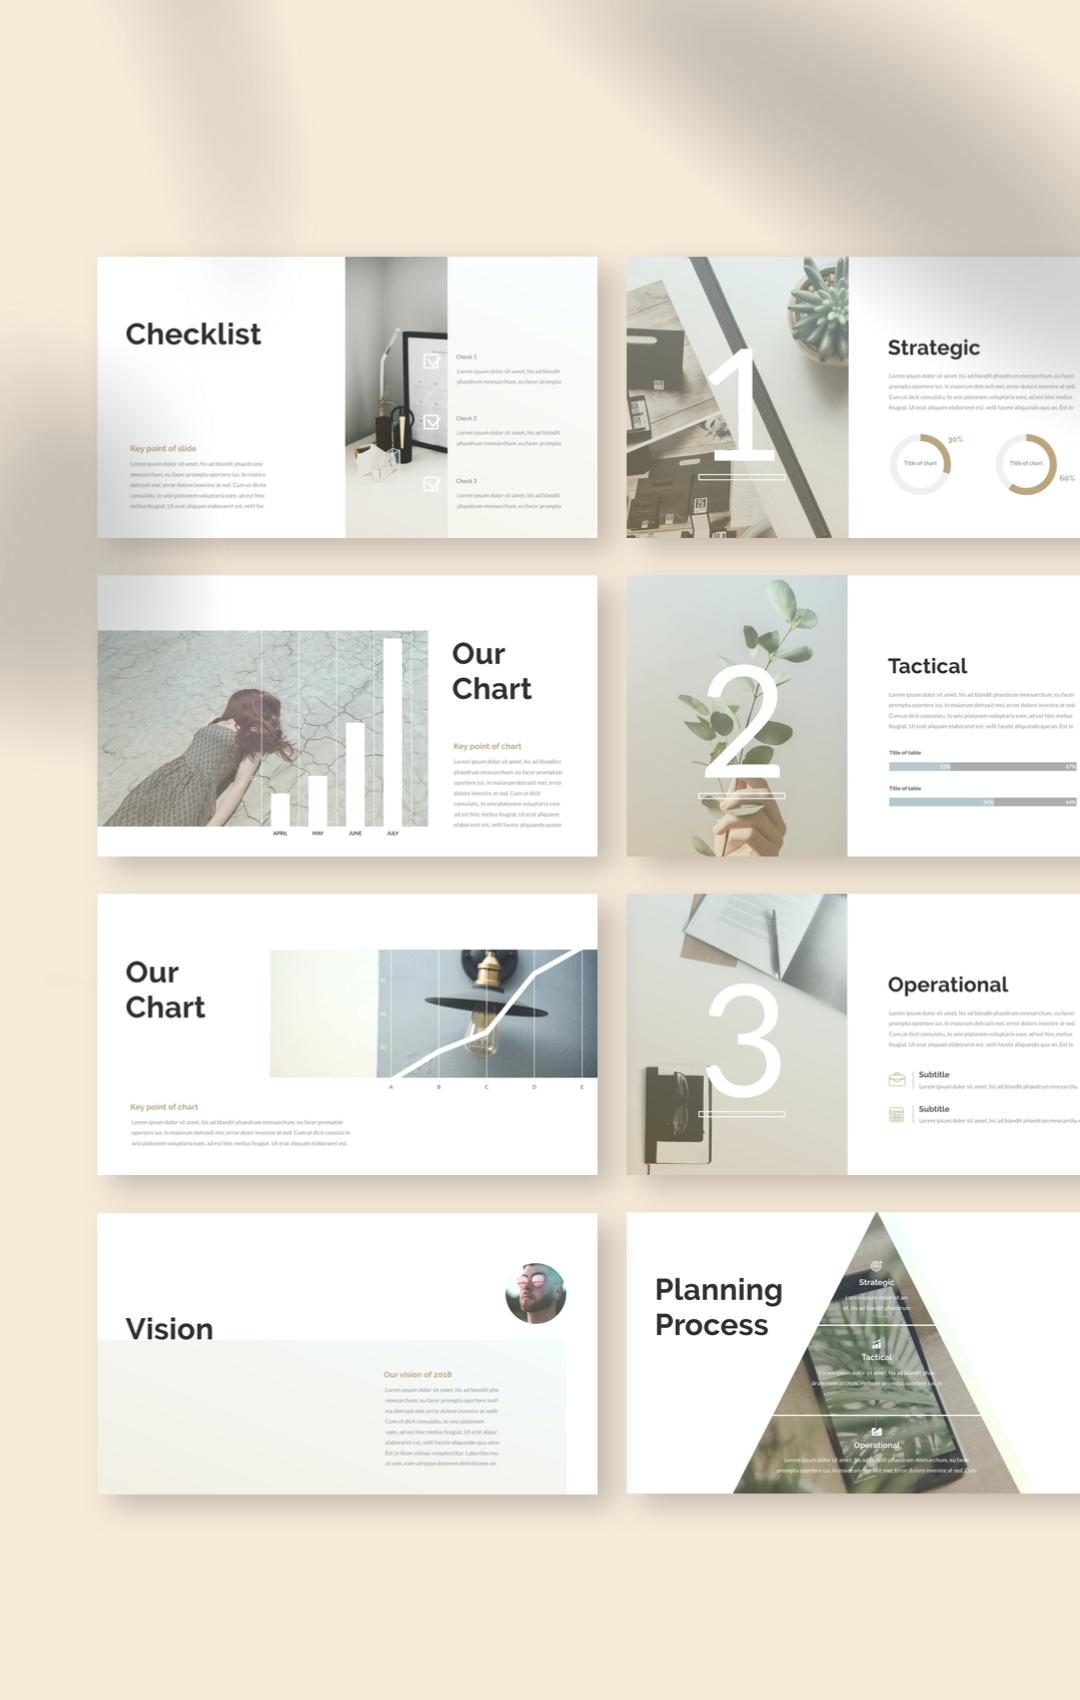 2020 Strategic Planning Template Powerpoint Strategic Planning Template Business Presentation Templates Powerpoint Design Templates